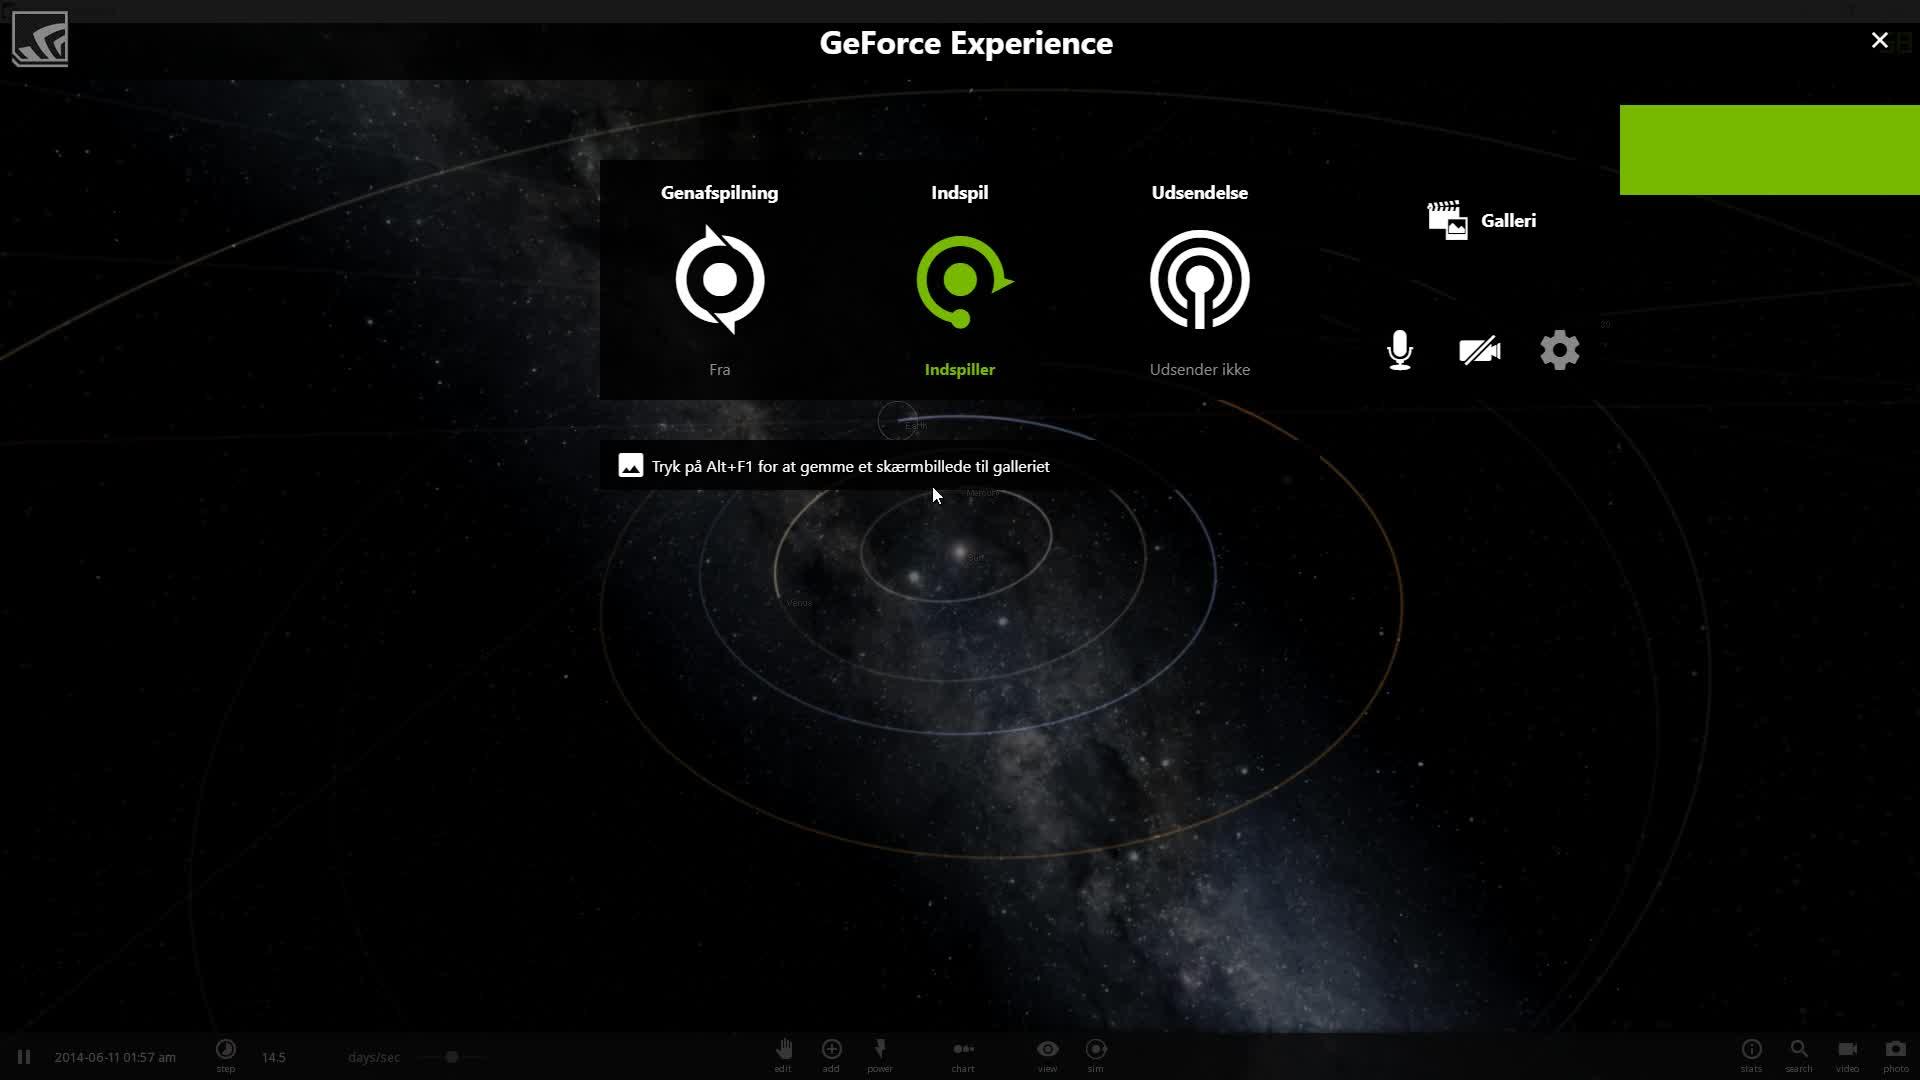 Universe Sandbox 2 12.05.2017 - 20.56.19.13 GIFs